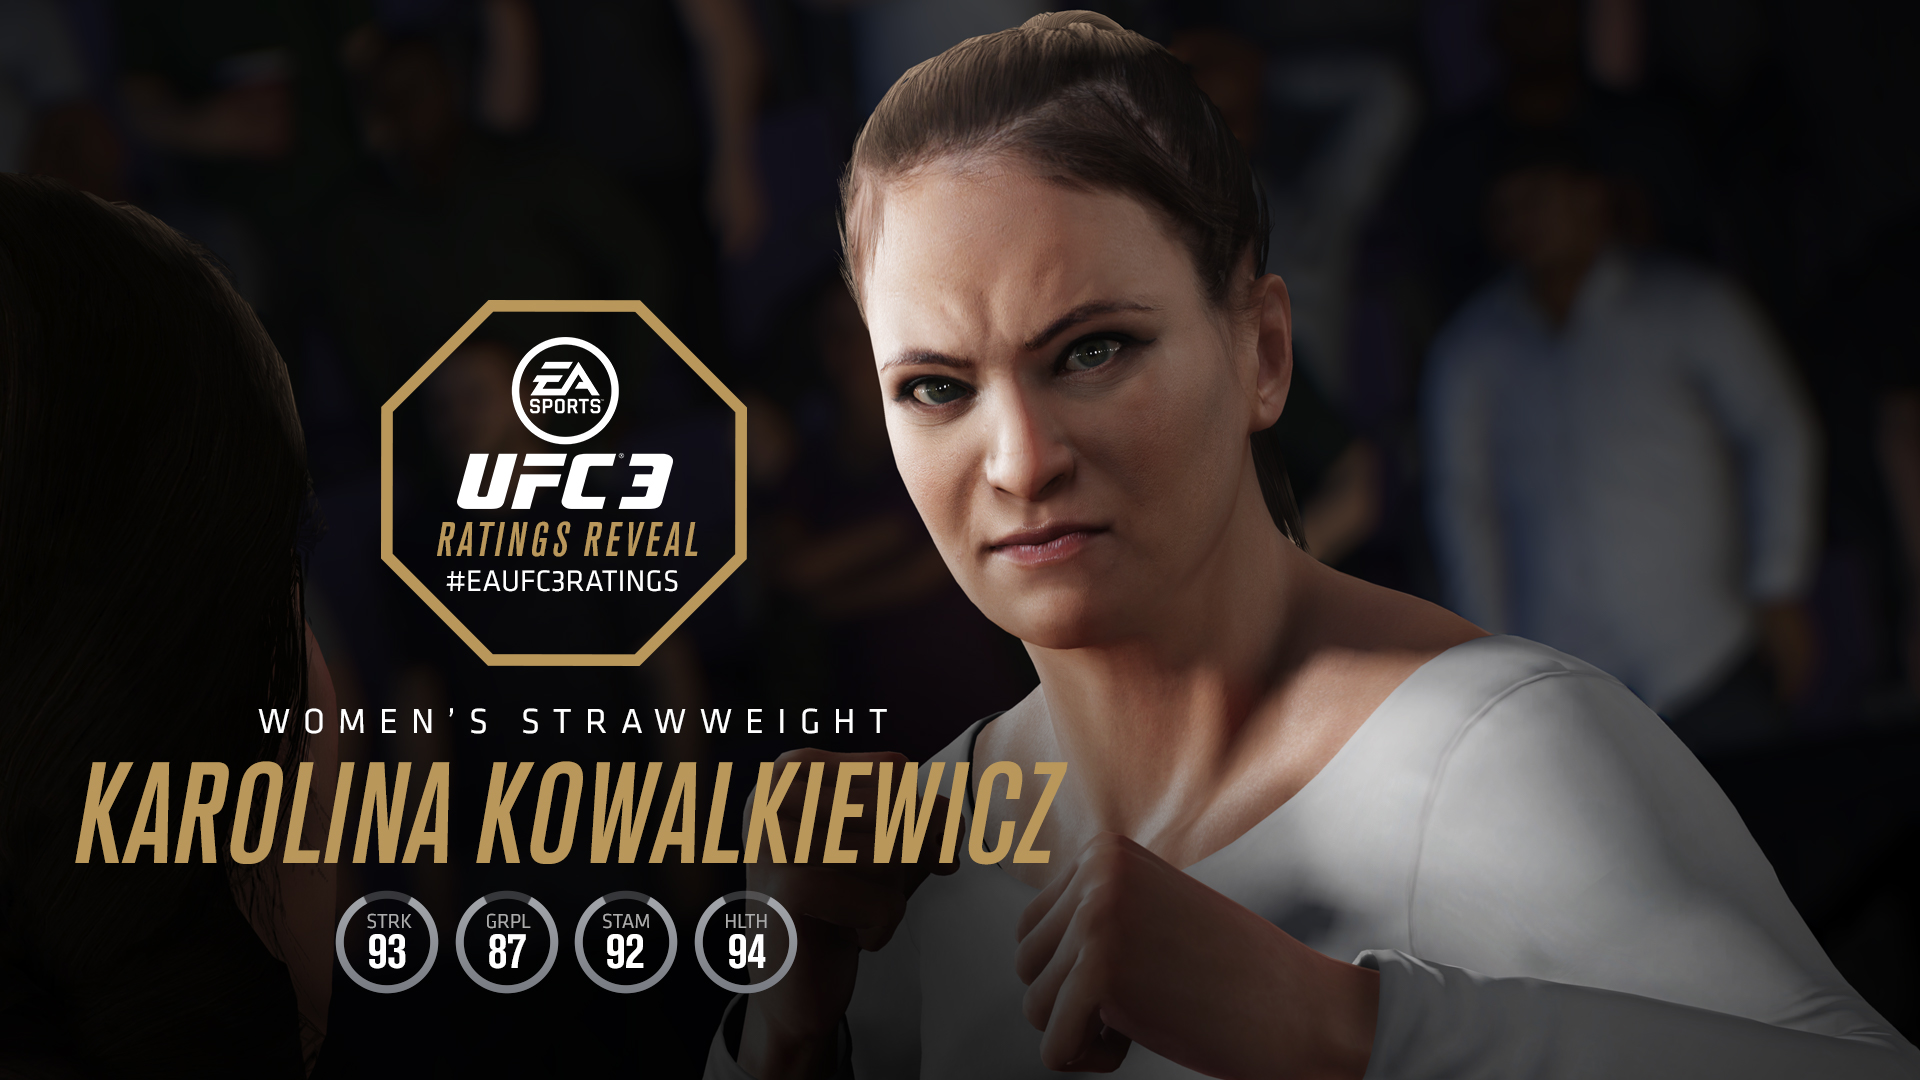 KarolinaKowalkiewicz_WomensStrawweight_1920x1080